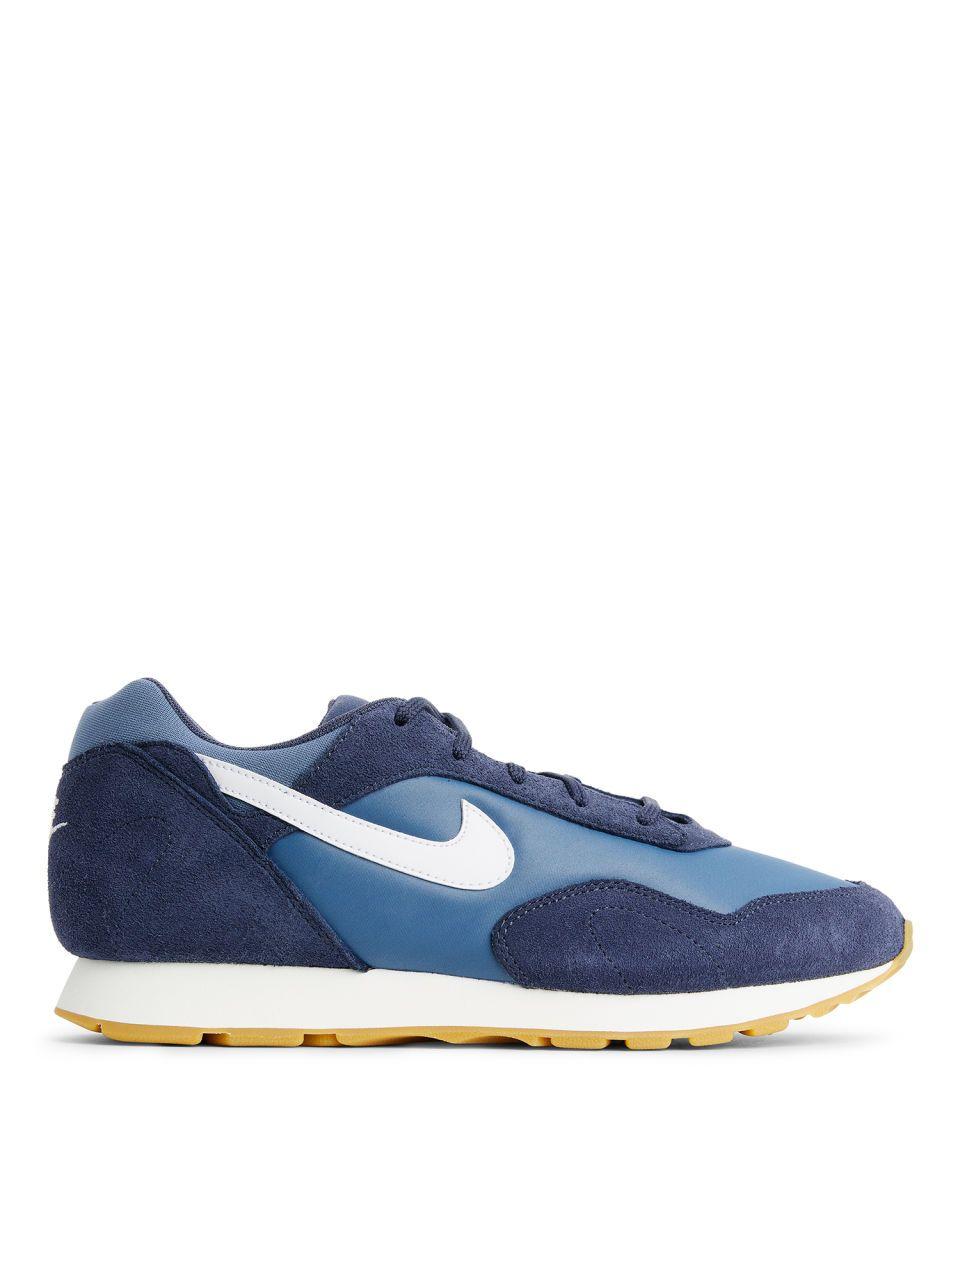 Nike Outburst   Blue shoes, Shoes